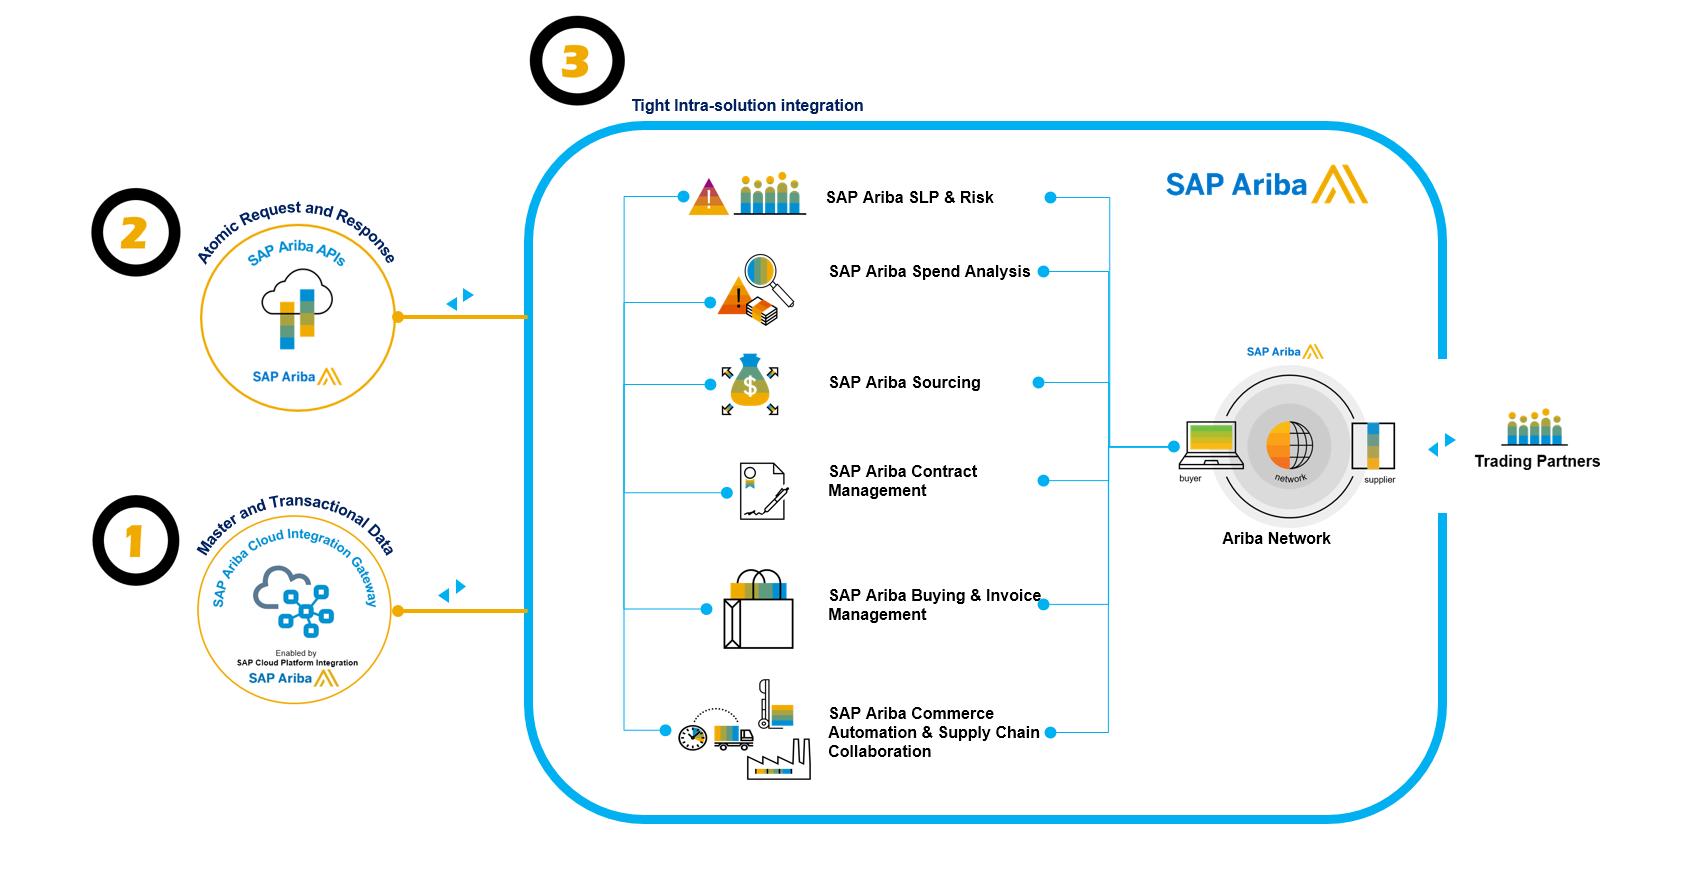 SAP Ariba\'s 3 pillars of integration.